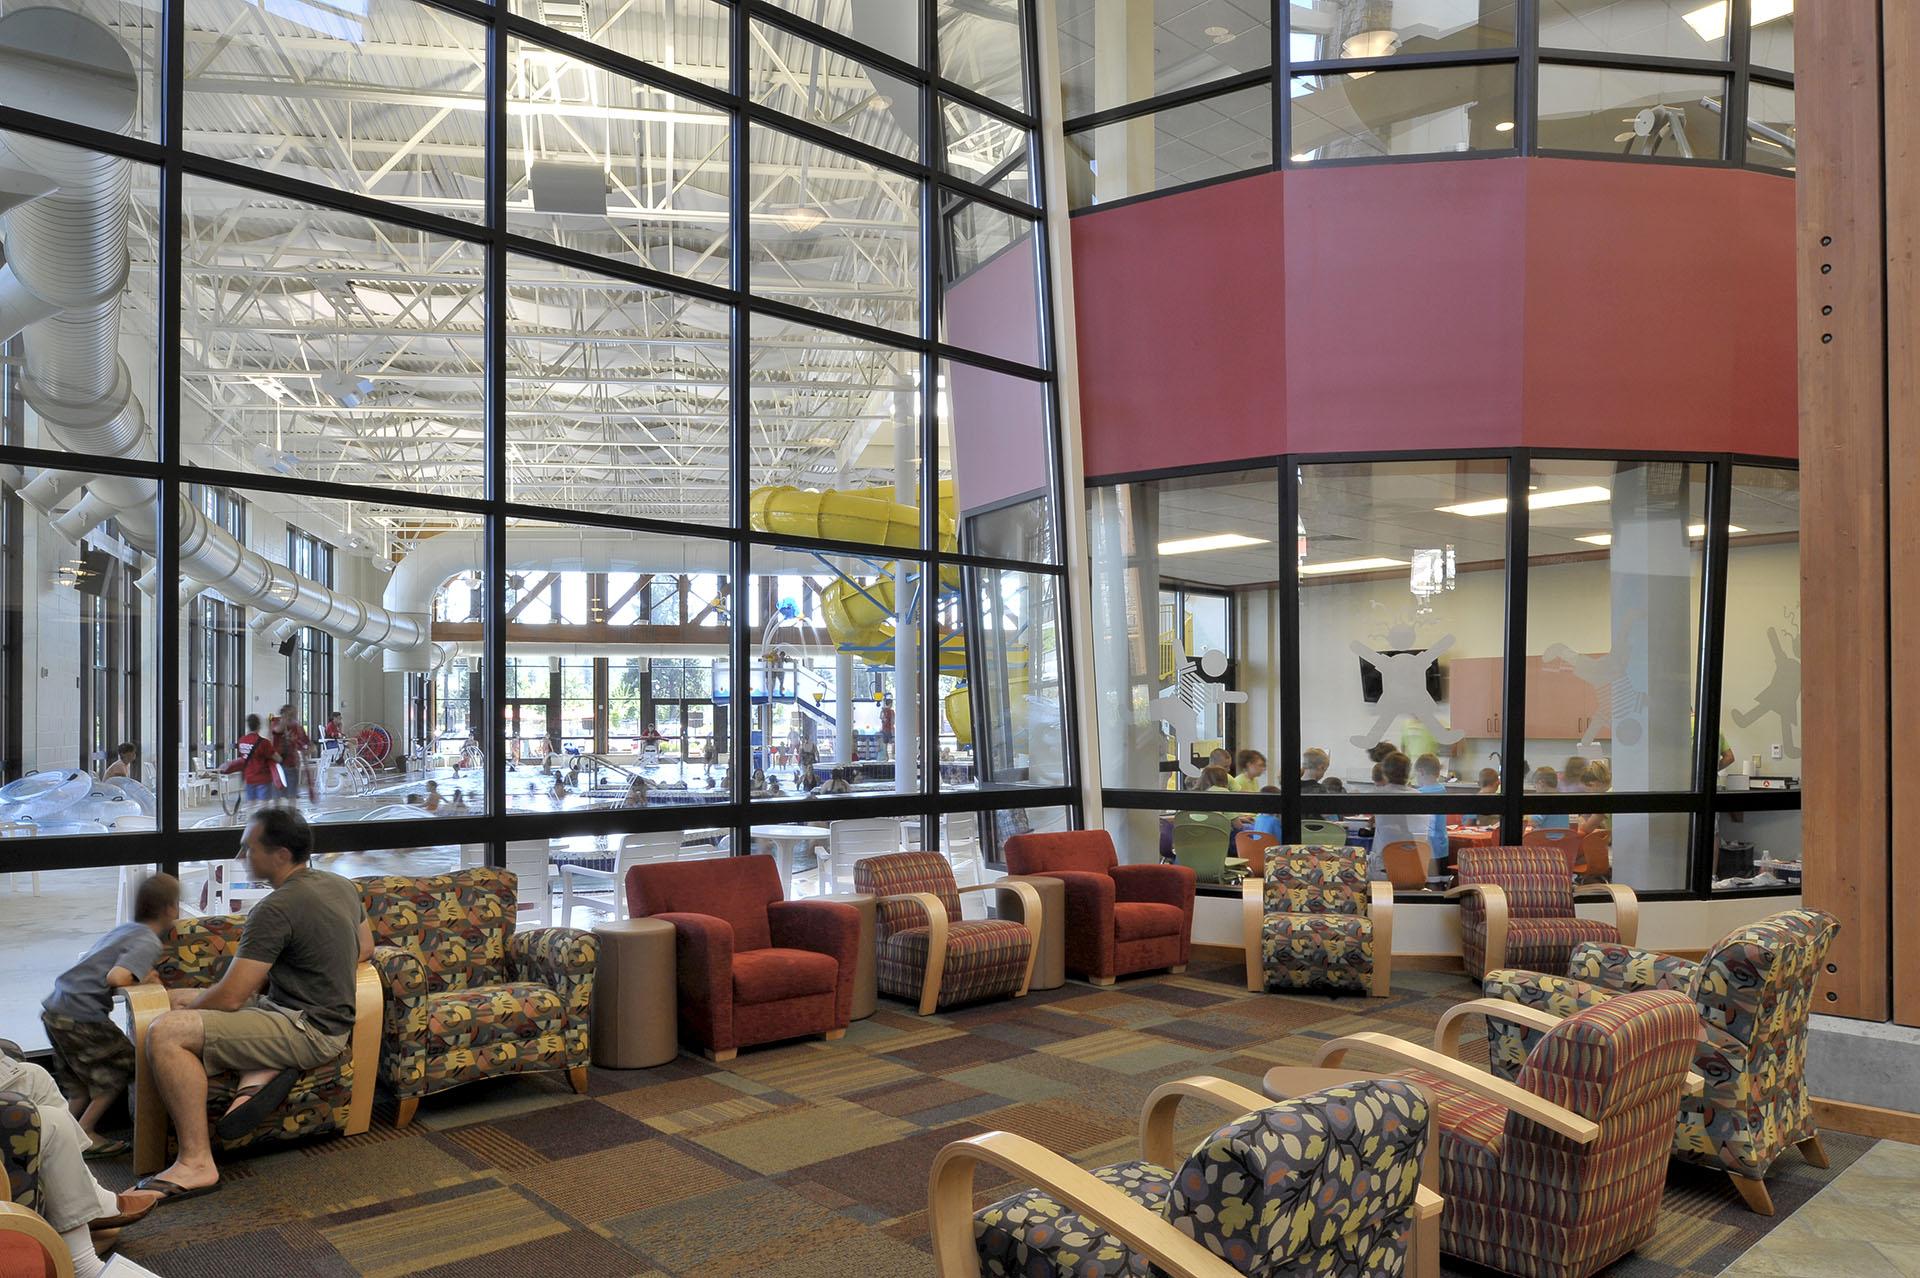 Kroc Community Center Pool Overlook